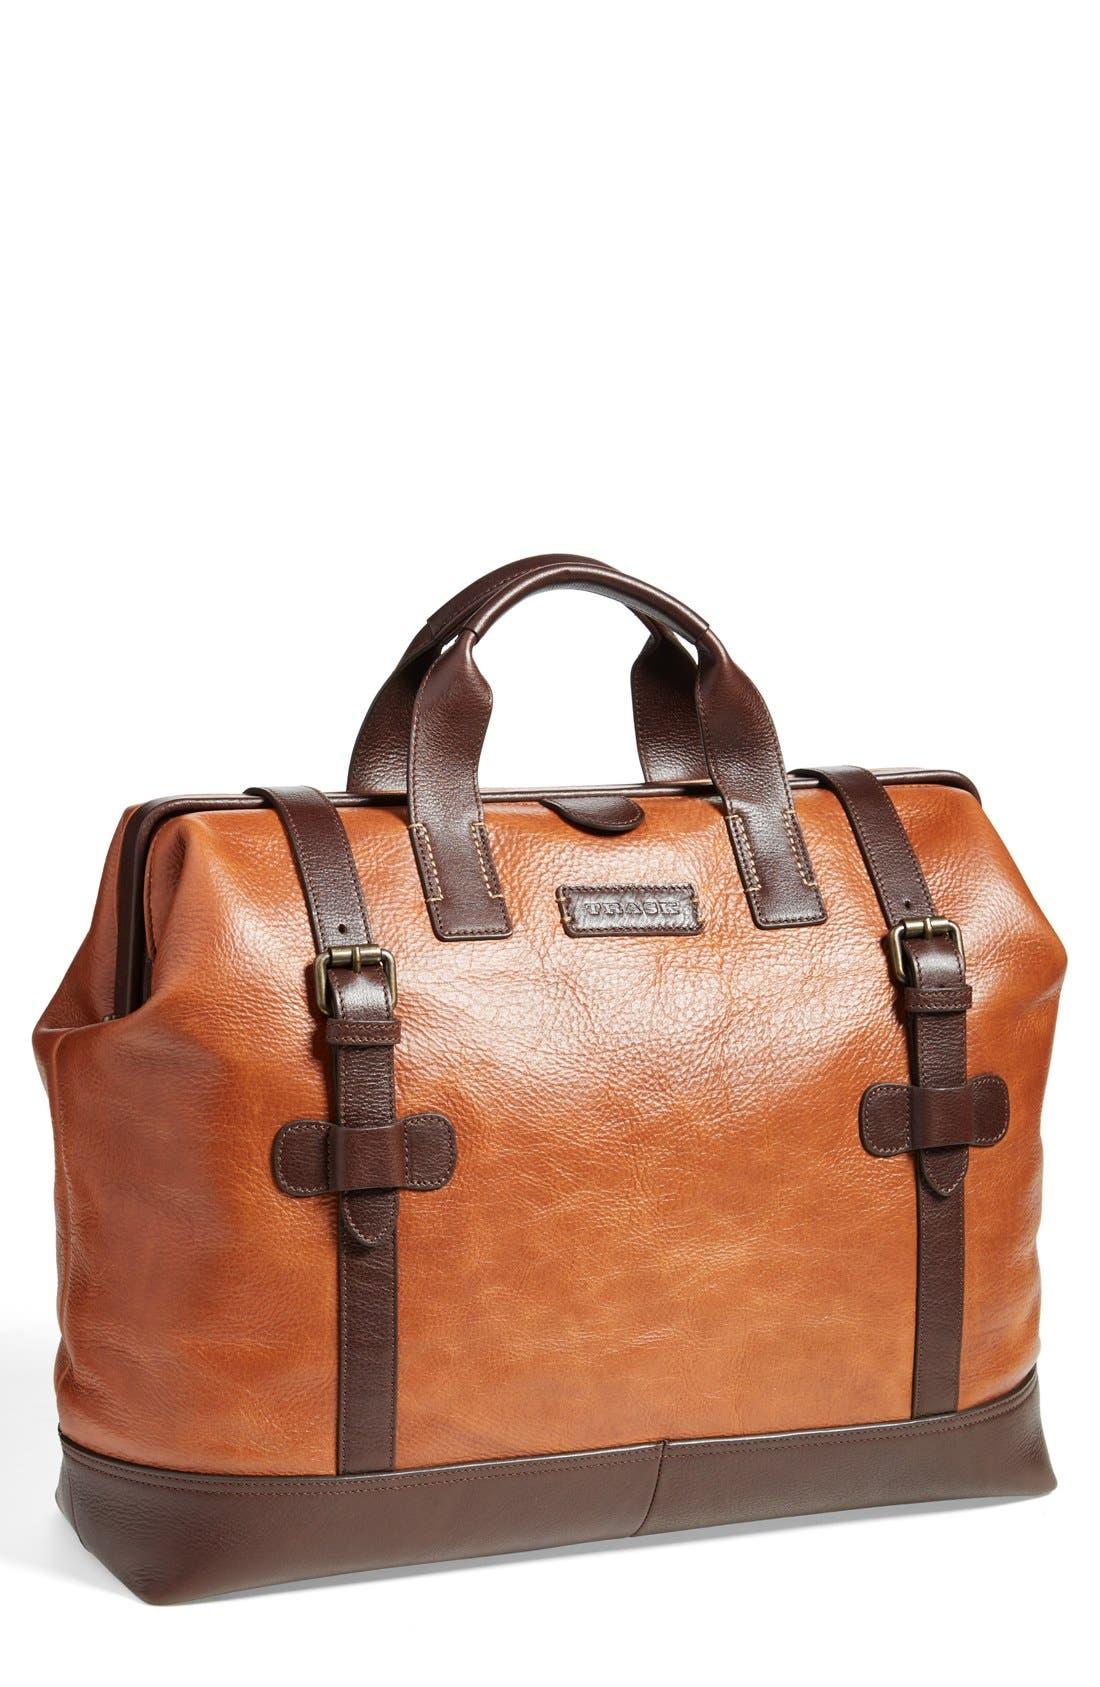 TRASK Jackson Gladstone Bag